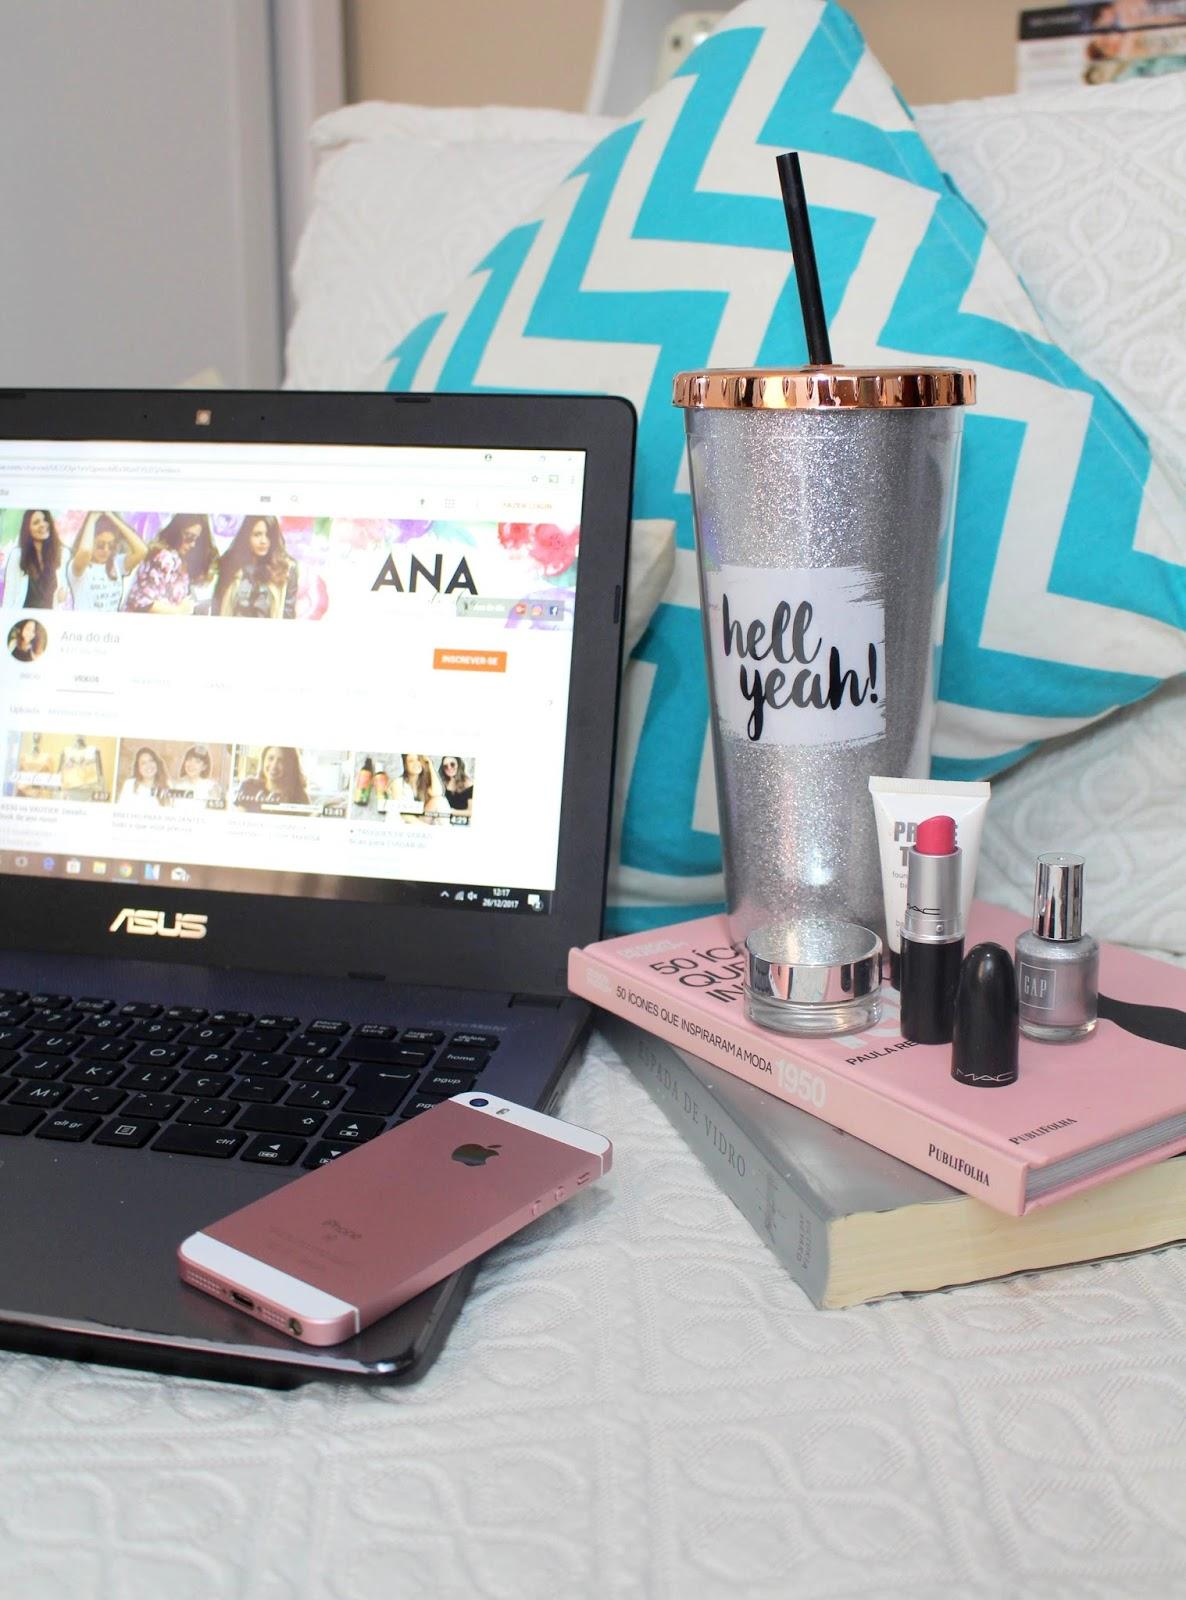 ana laura soares ana do dia anadodia perfil blogueira guarulhos (2)